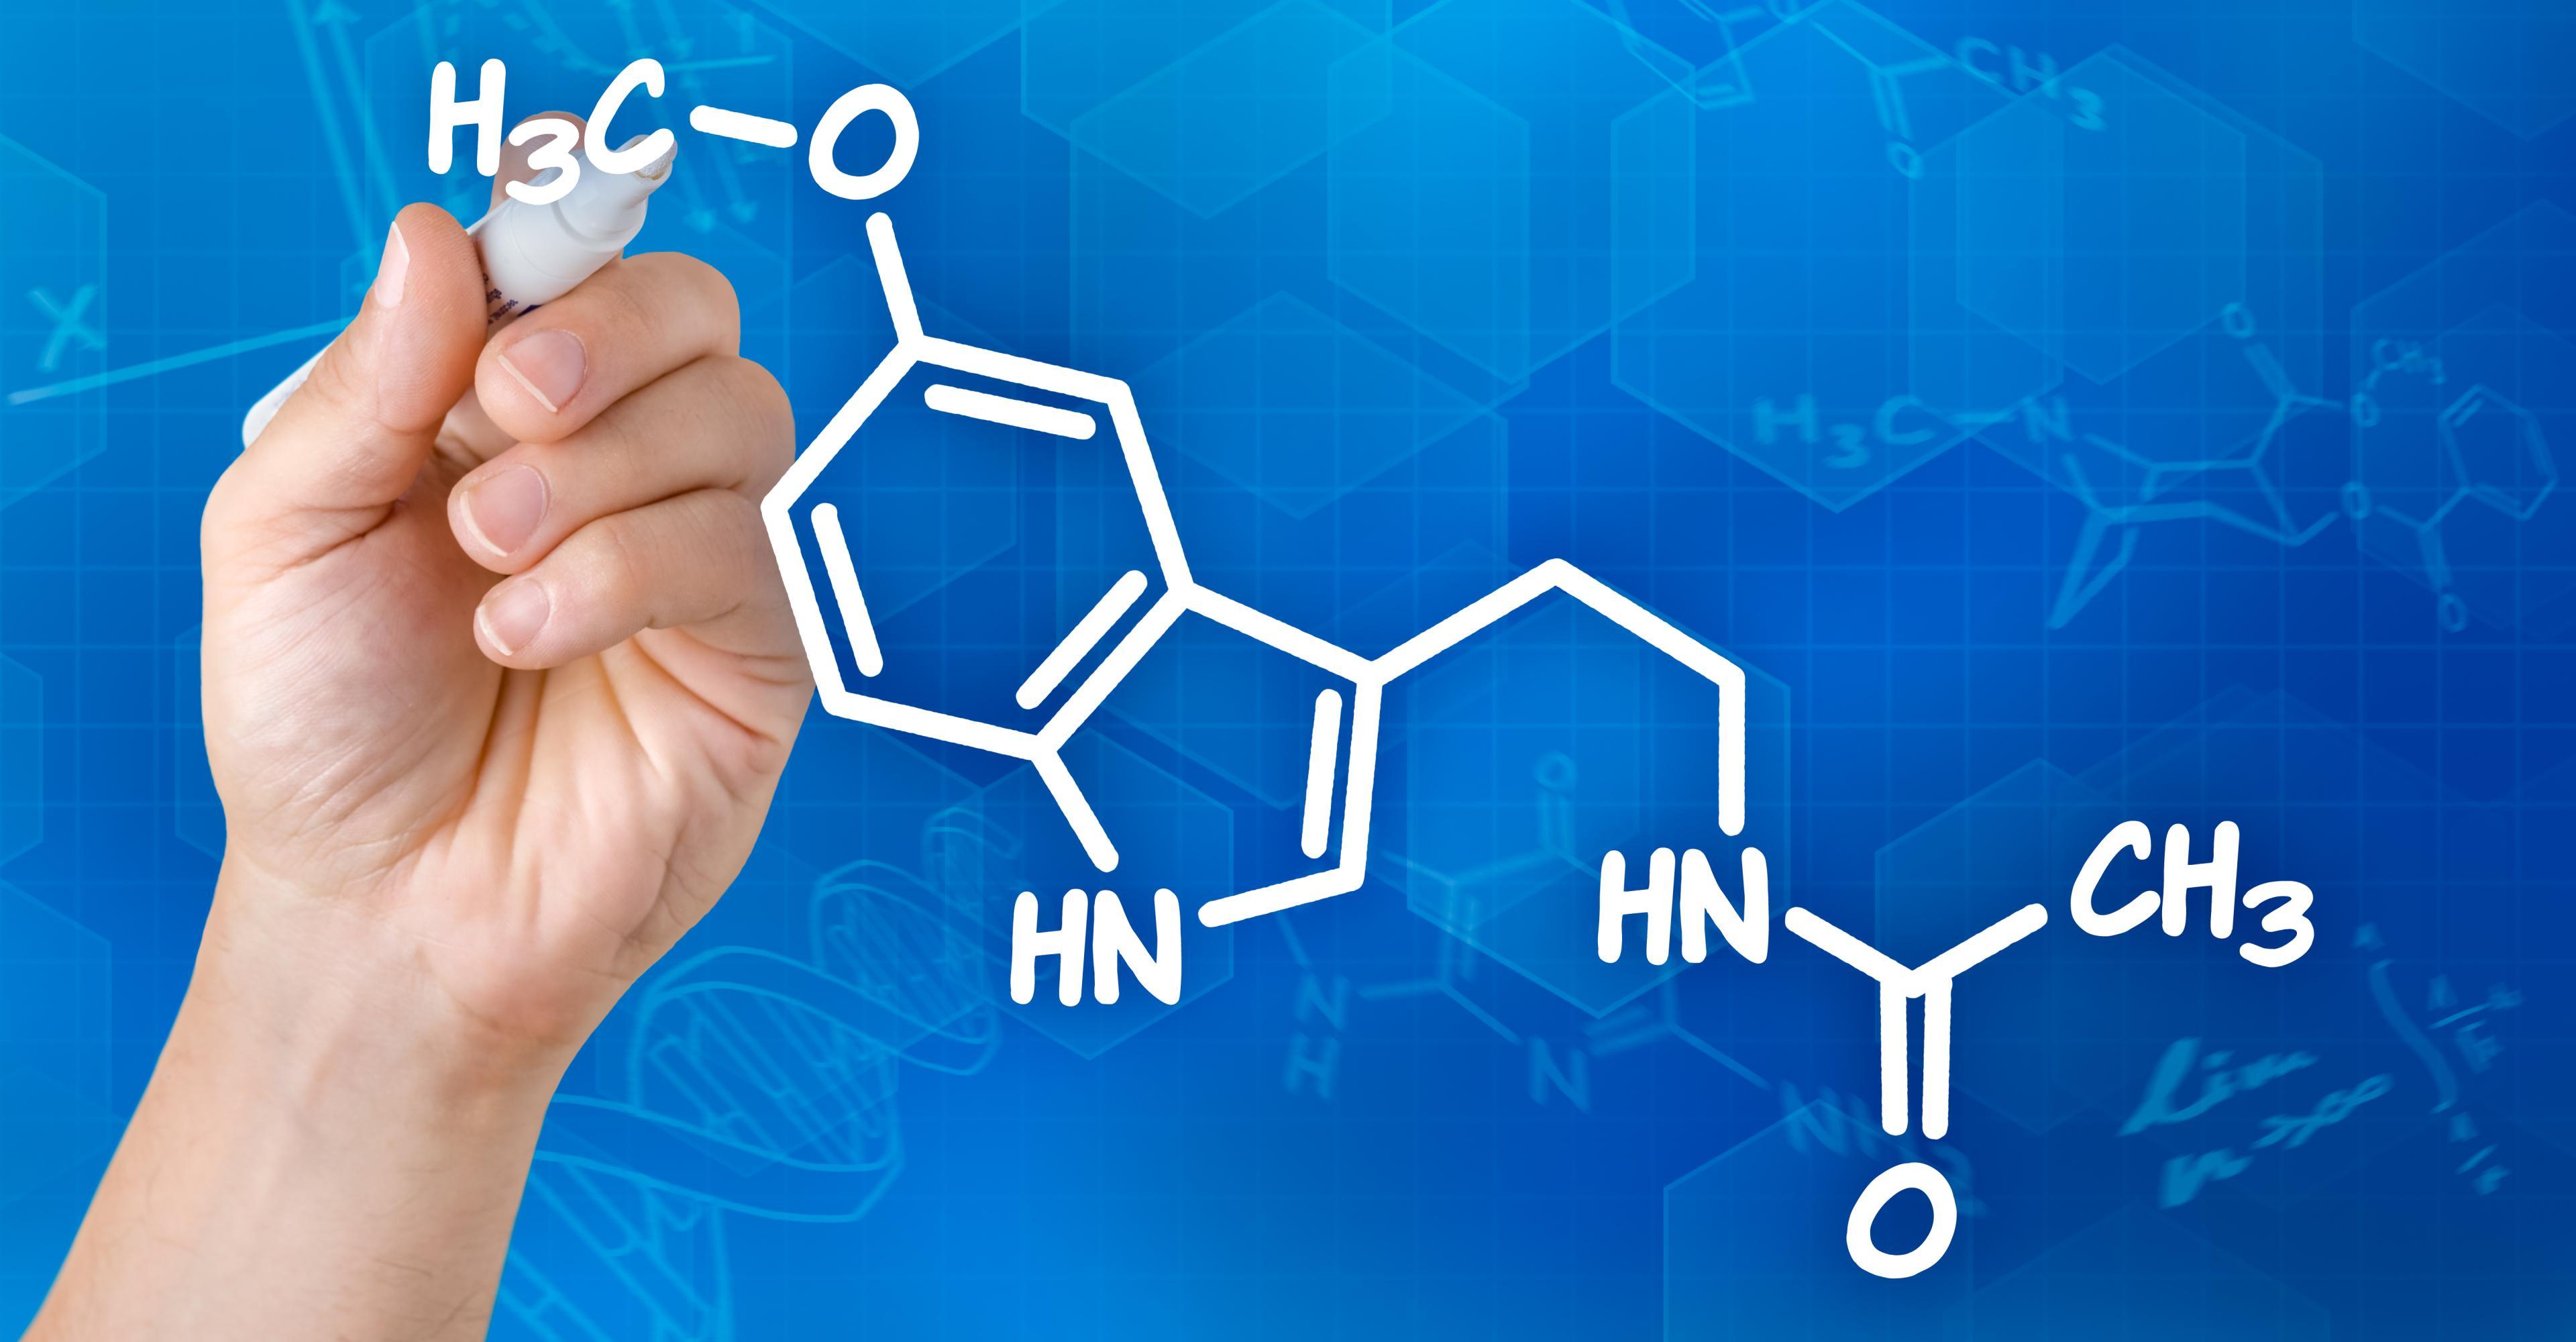 Мелатонин улучшает сон. Но как?